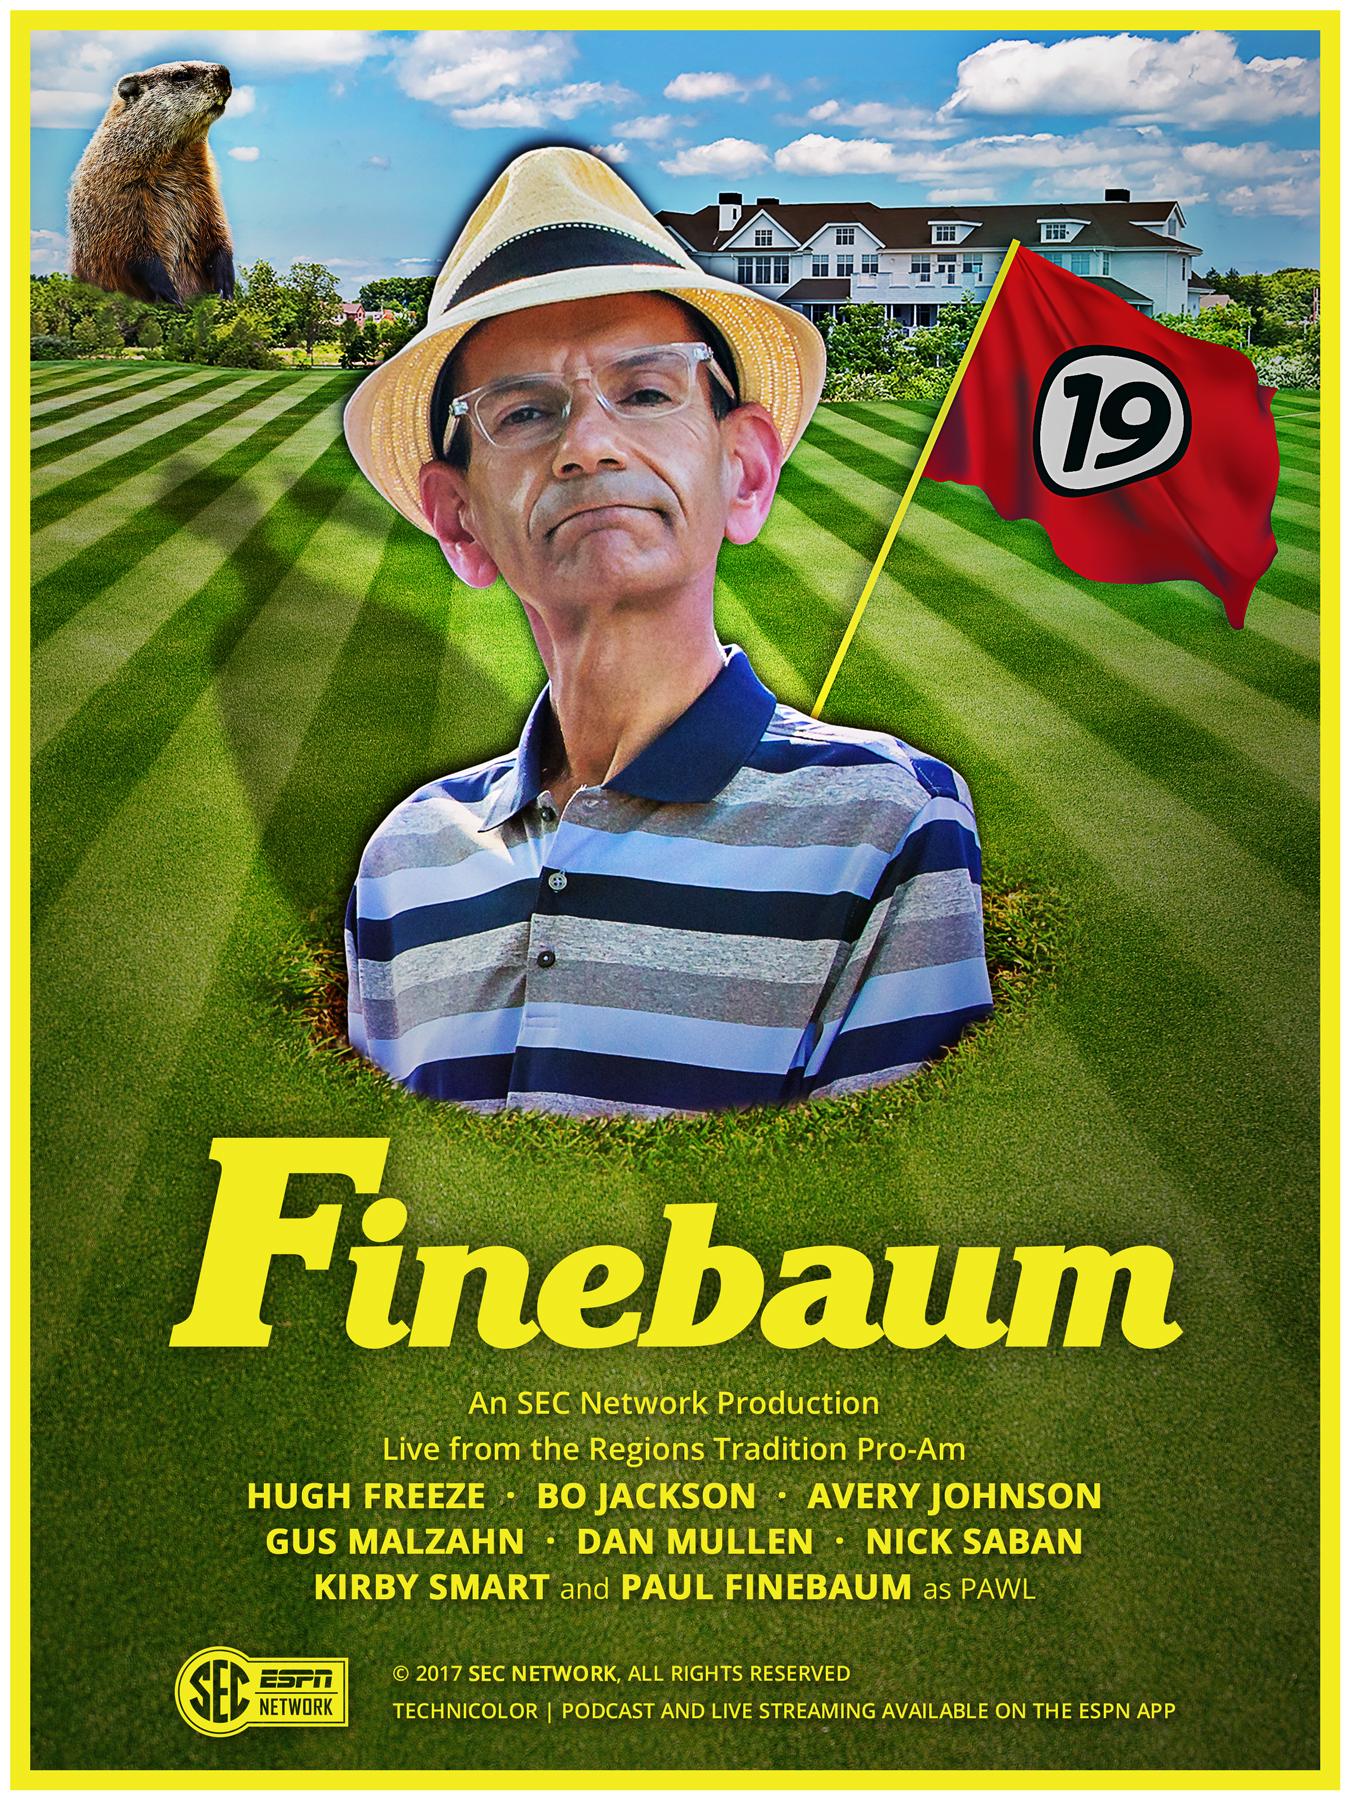 17051262PRO_SEC_Finebaum_Caddyshack_Update-OnAir-Social_Poster_Final.jpg